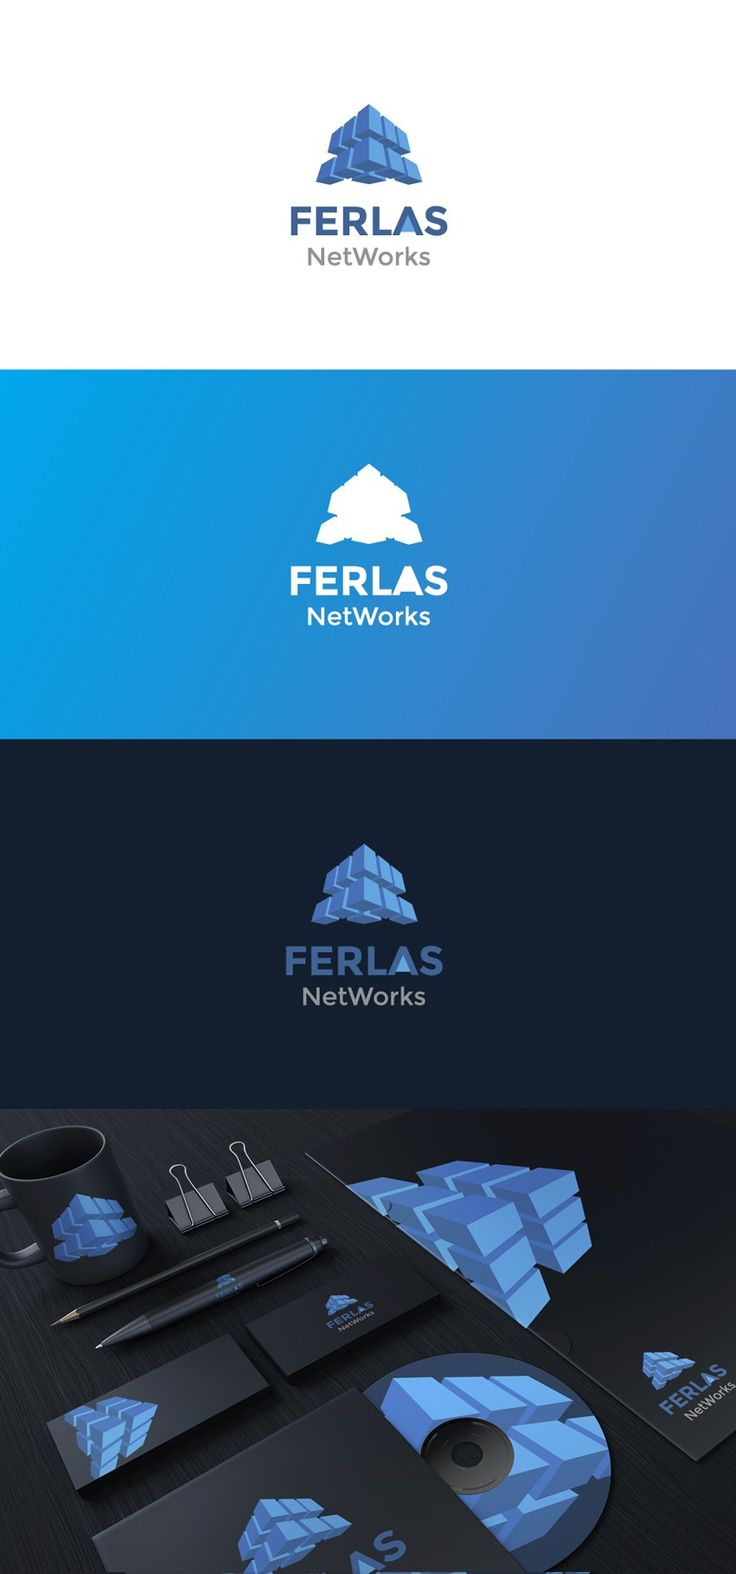 Ferlas NetWorks: identity proposition